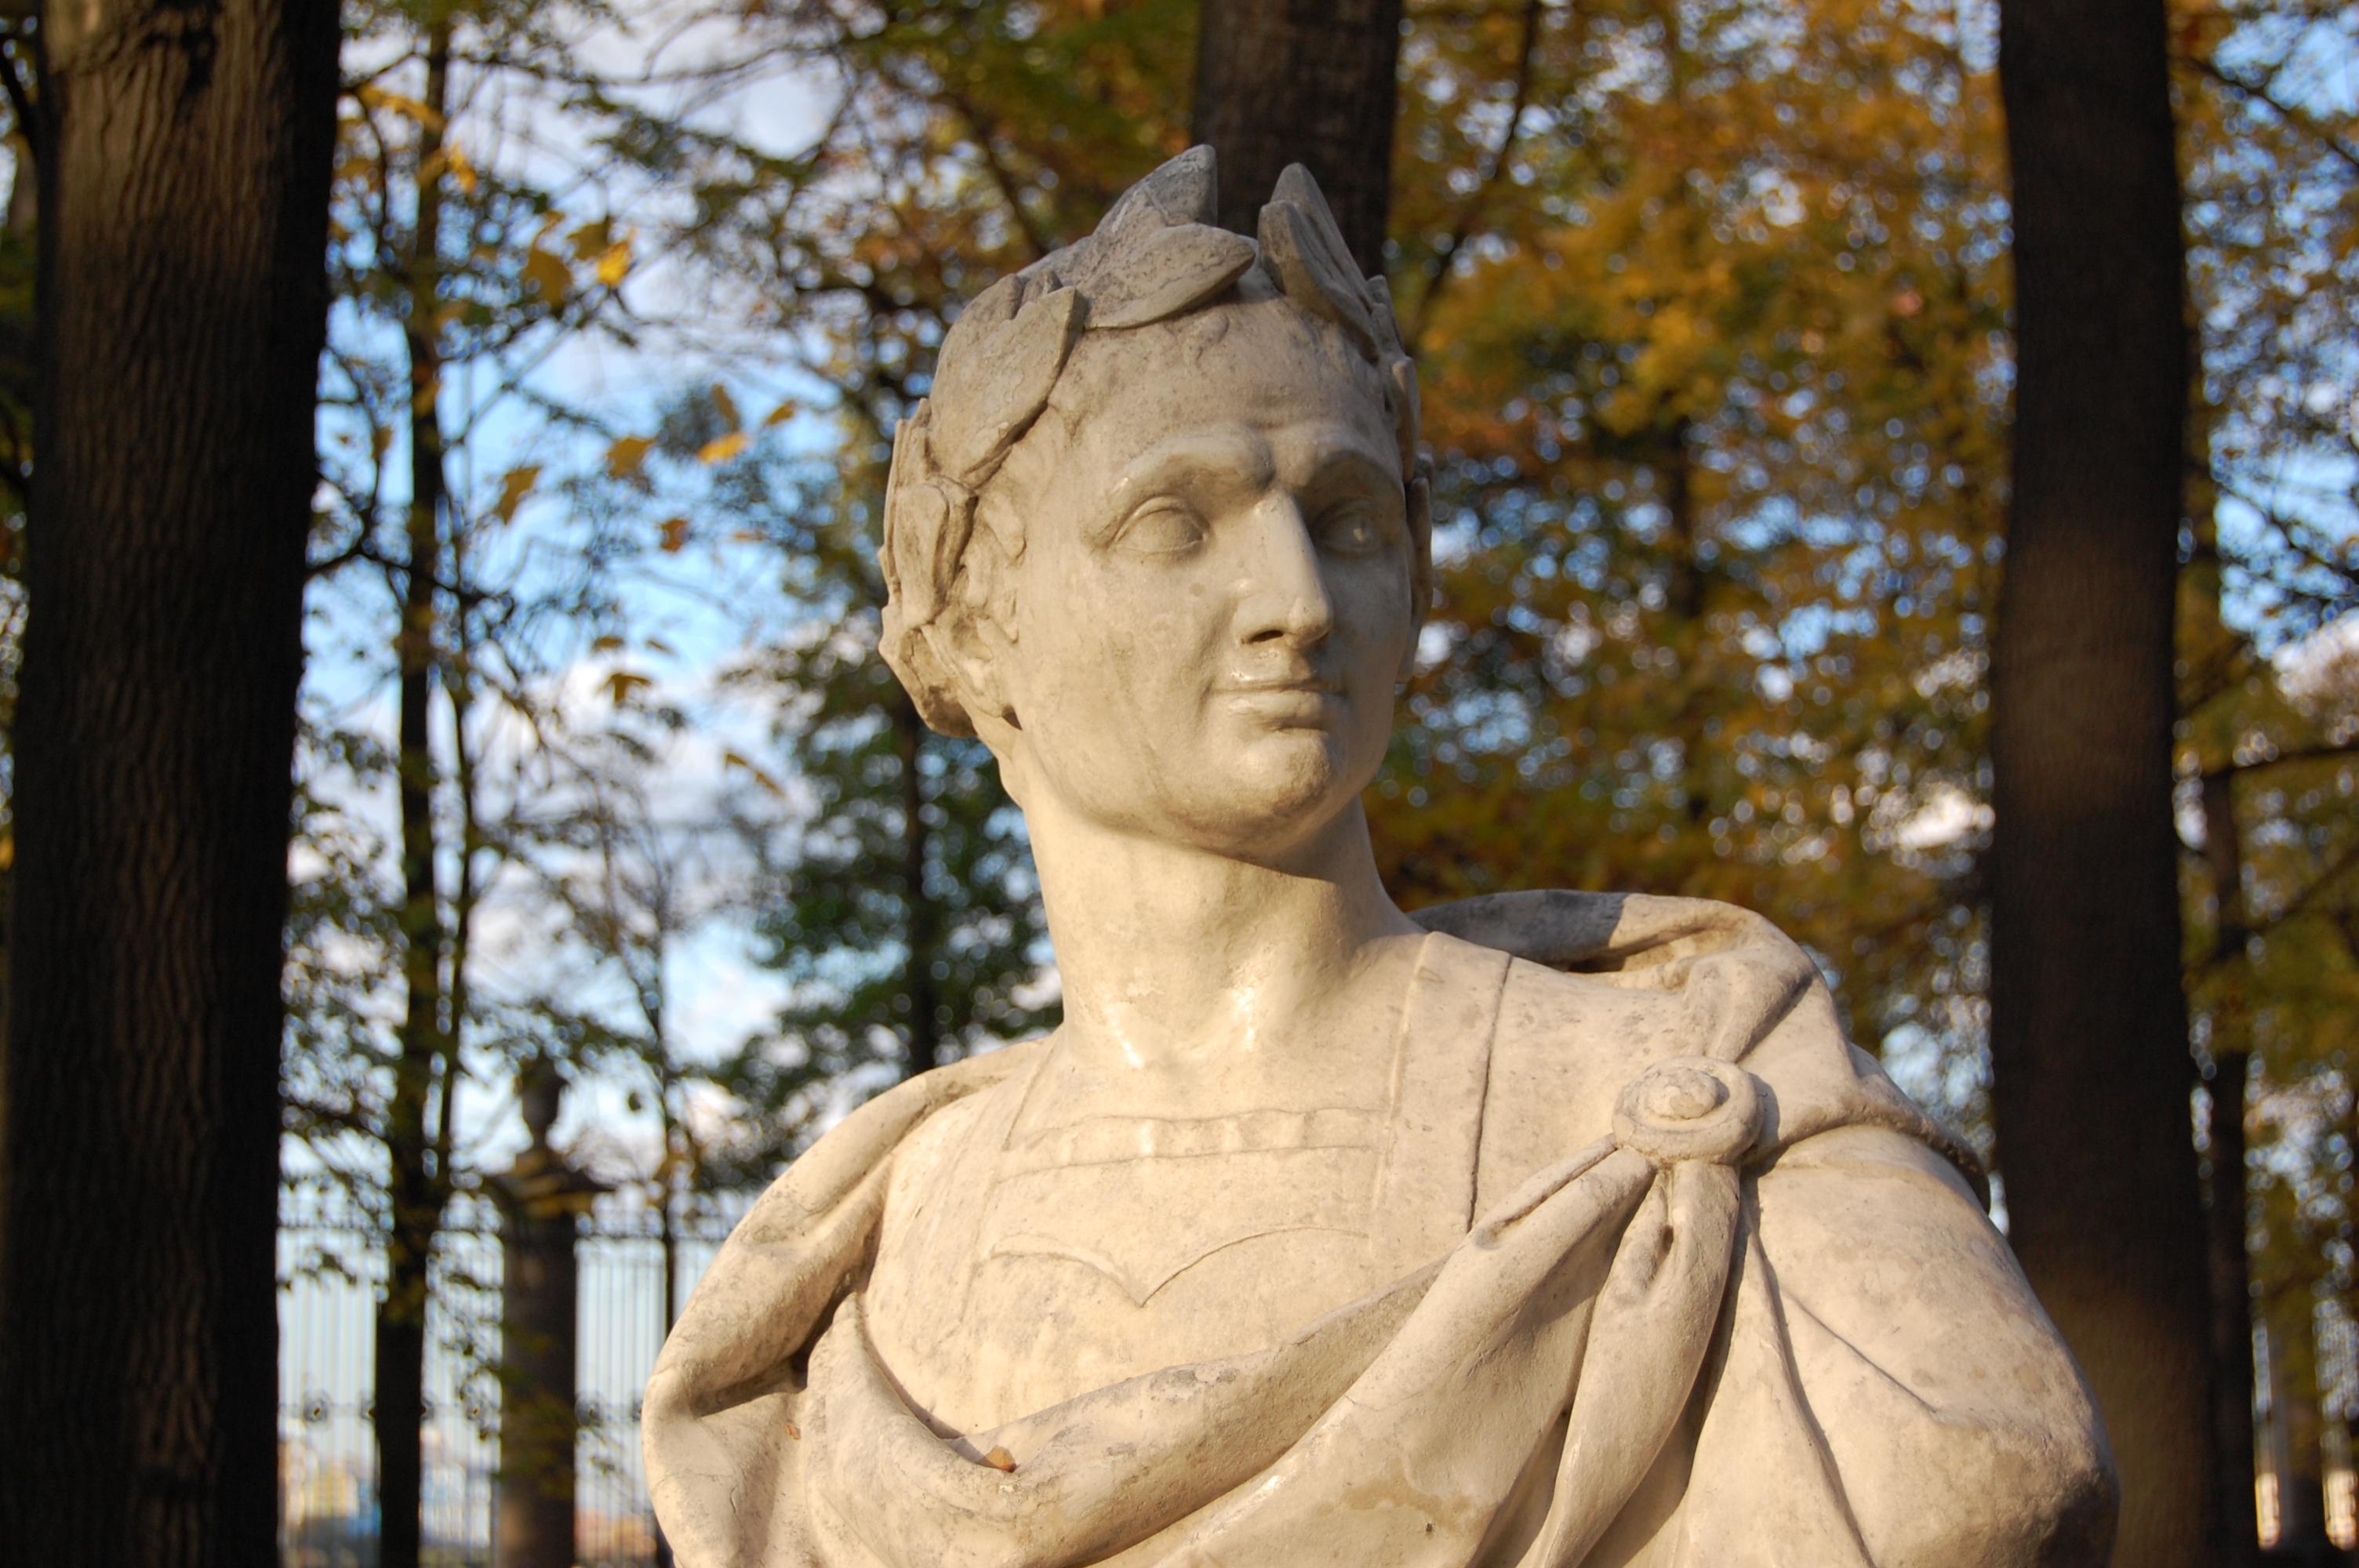 Bust of Julius Caesar in Summer Garden of Saint-Petersburg @ Mithrandire CC-BY-SA-3.0